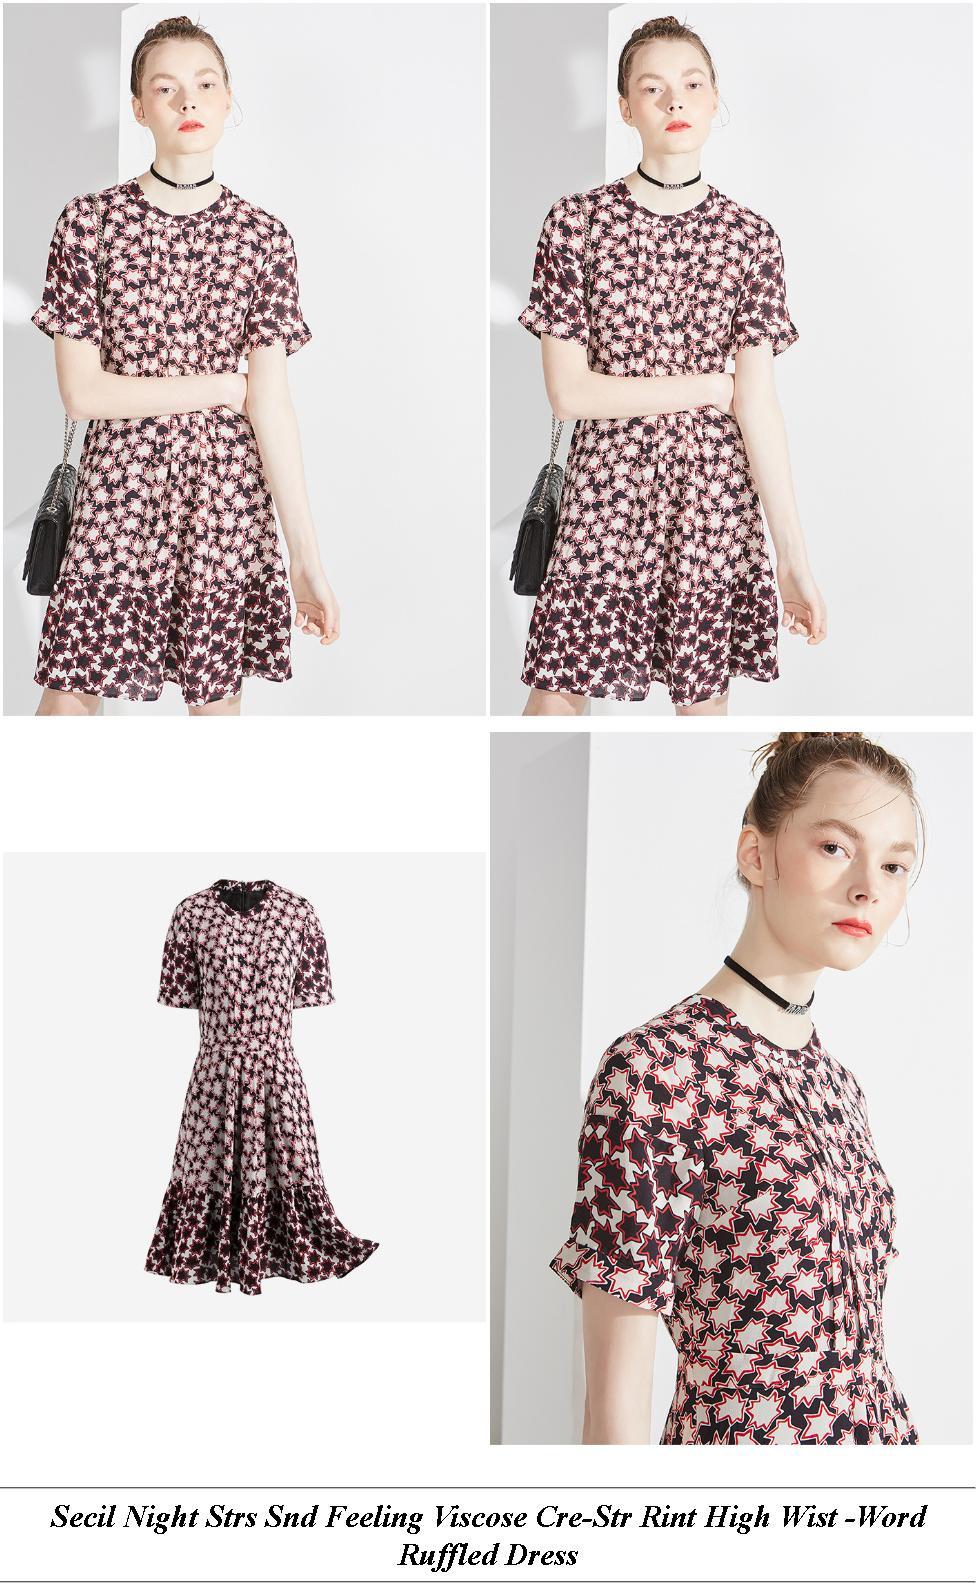 Cheap Dresses Under - Est Online Vintage Clothing Stores - All Ladies Dresses Name